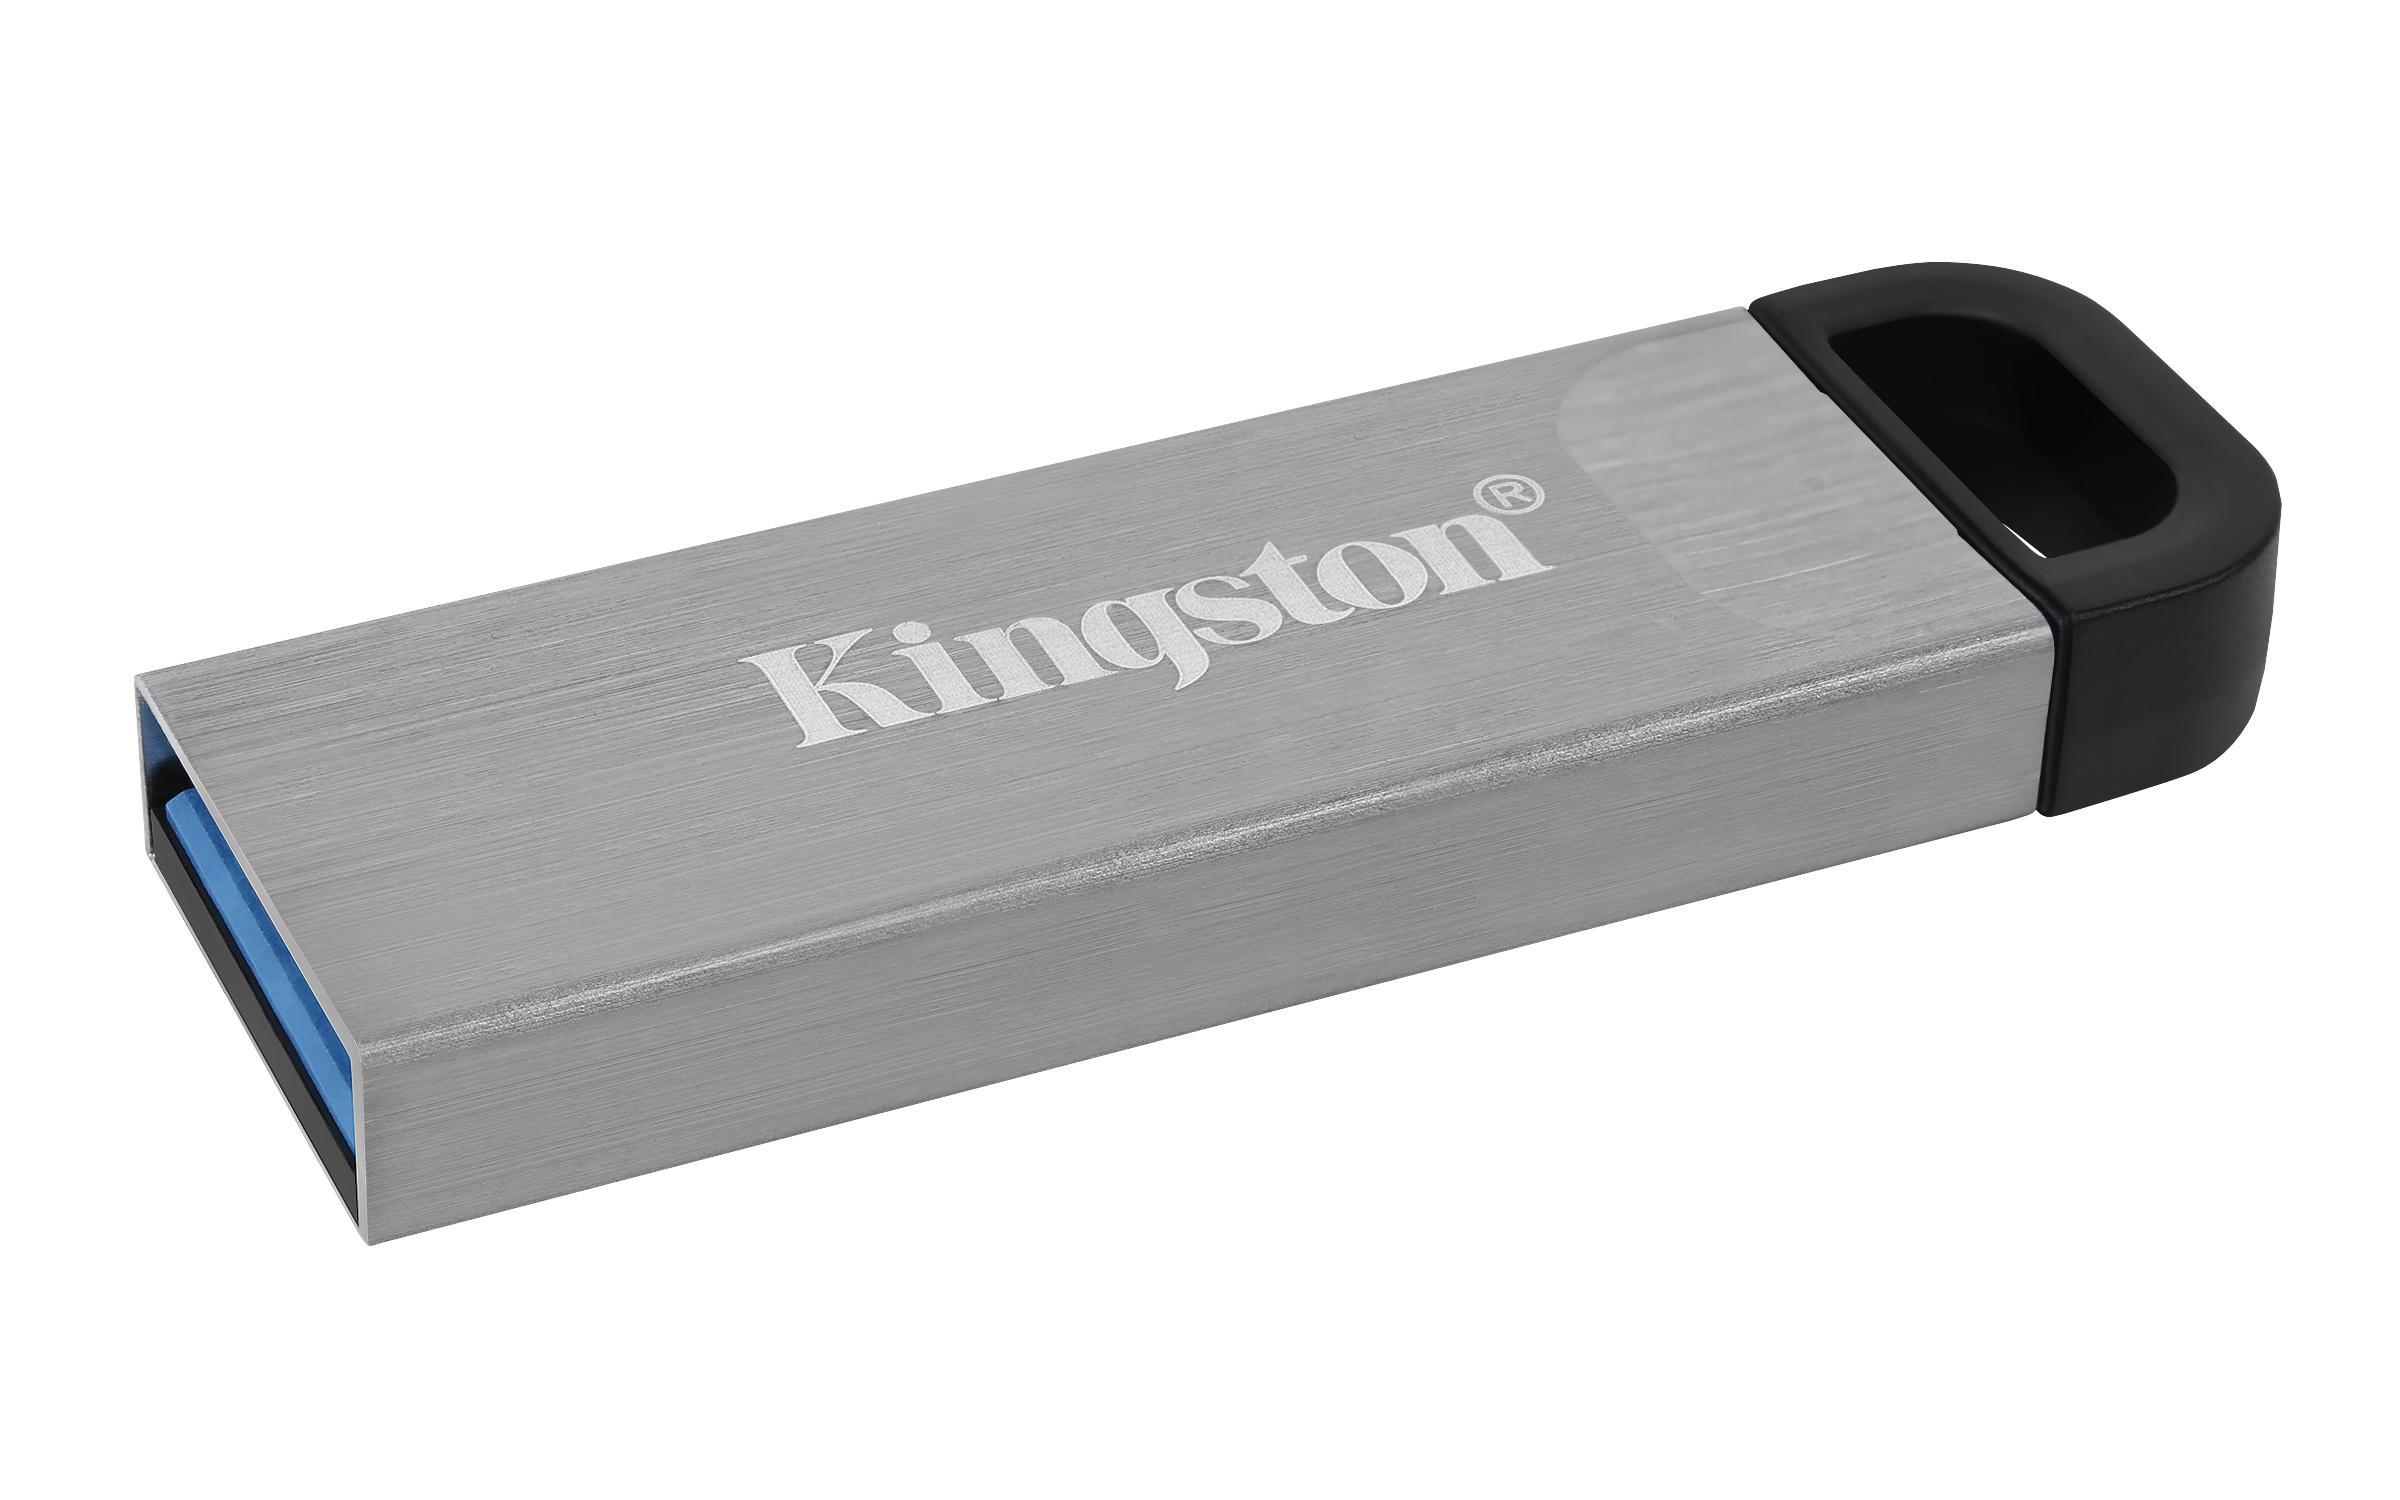 USB памет KINGSTON DataTraveler Kyson 64GB, USB 3.2 Gen 1, Сребрист-2